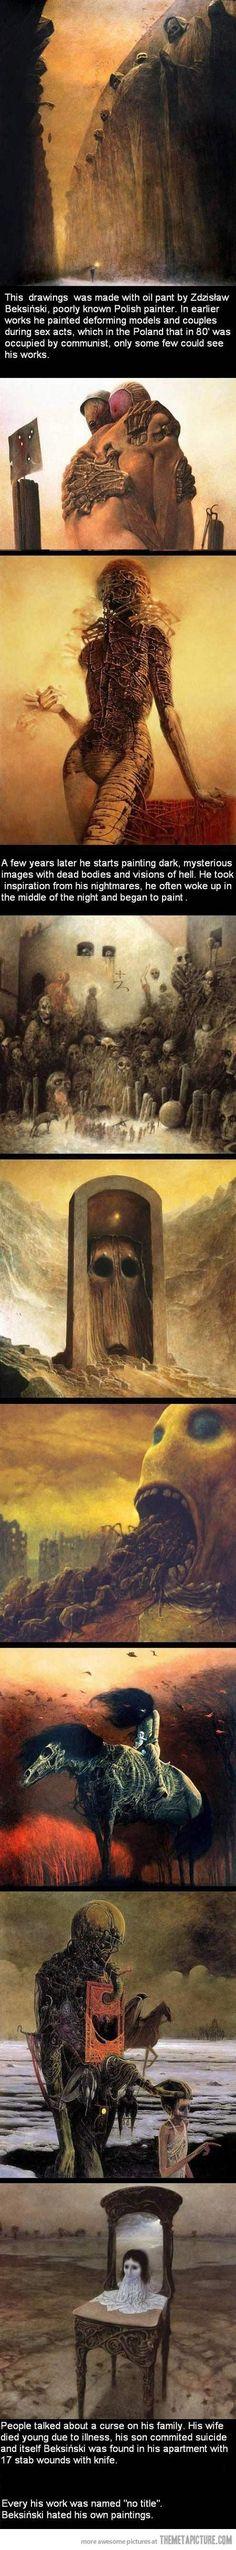 Zdzislaw Beksisnki's visions of hell.